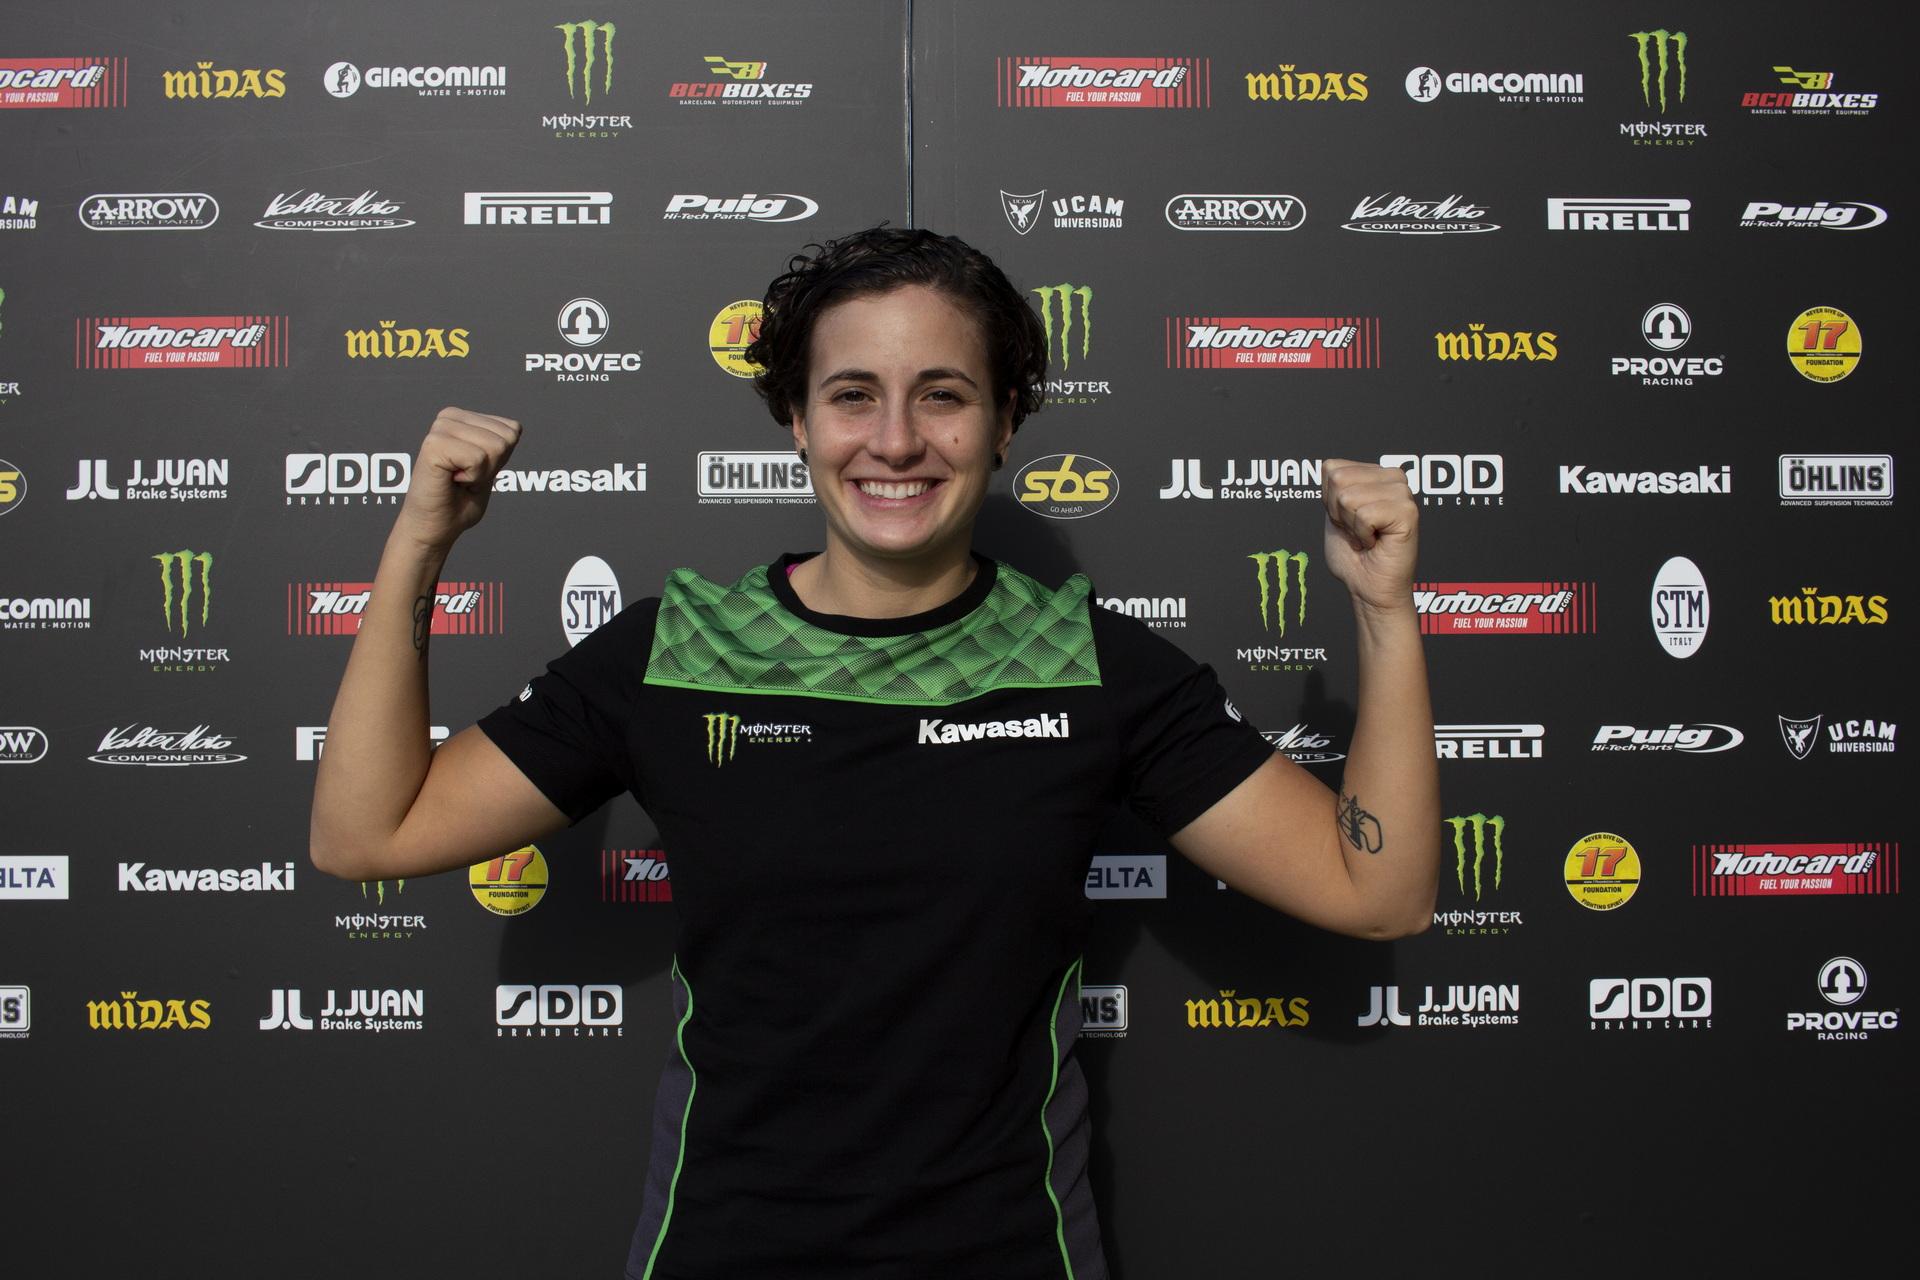 Ana Carrasco confirmada en el Provec Kawasaki para 2021